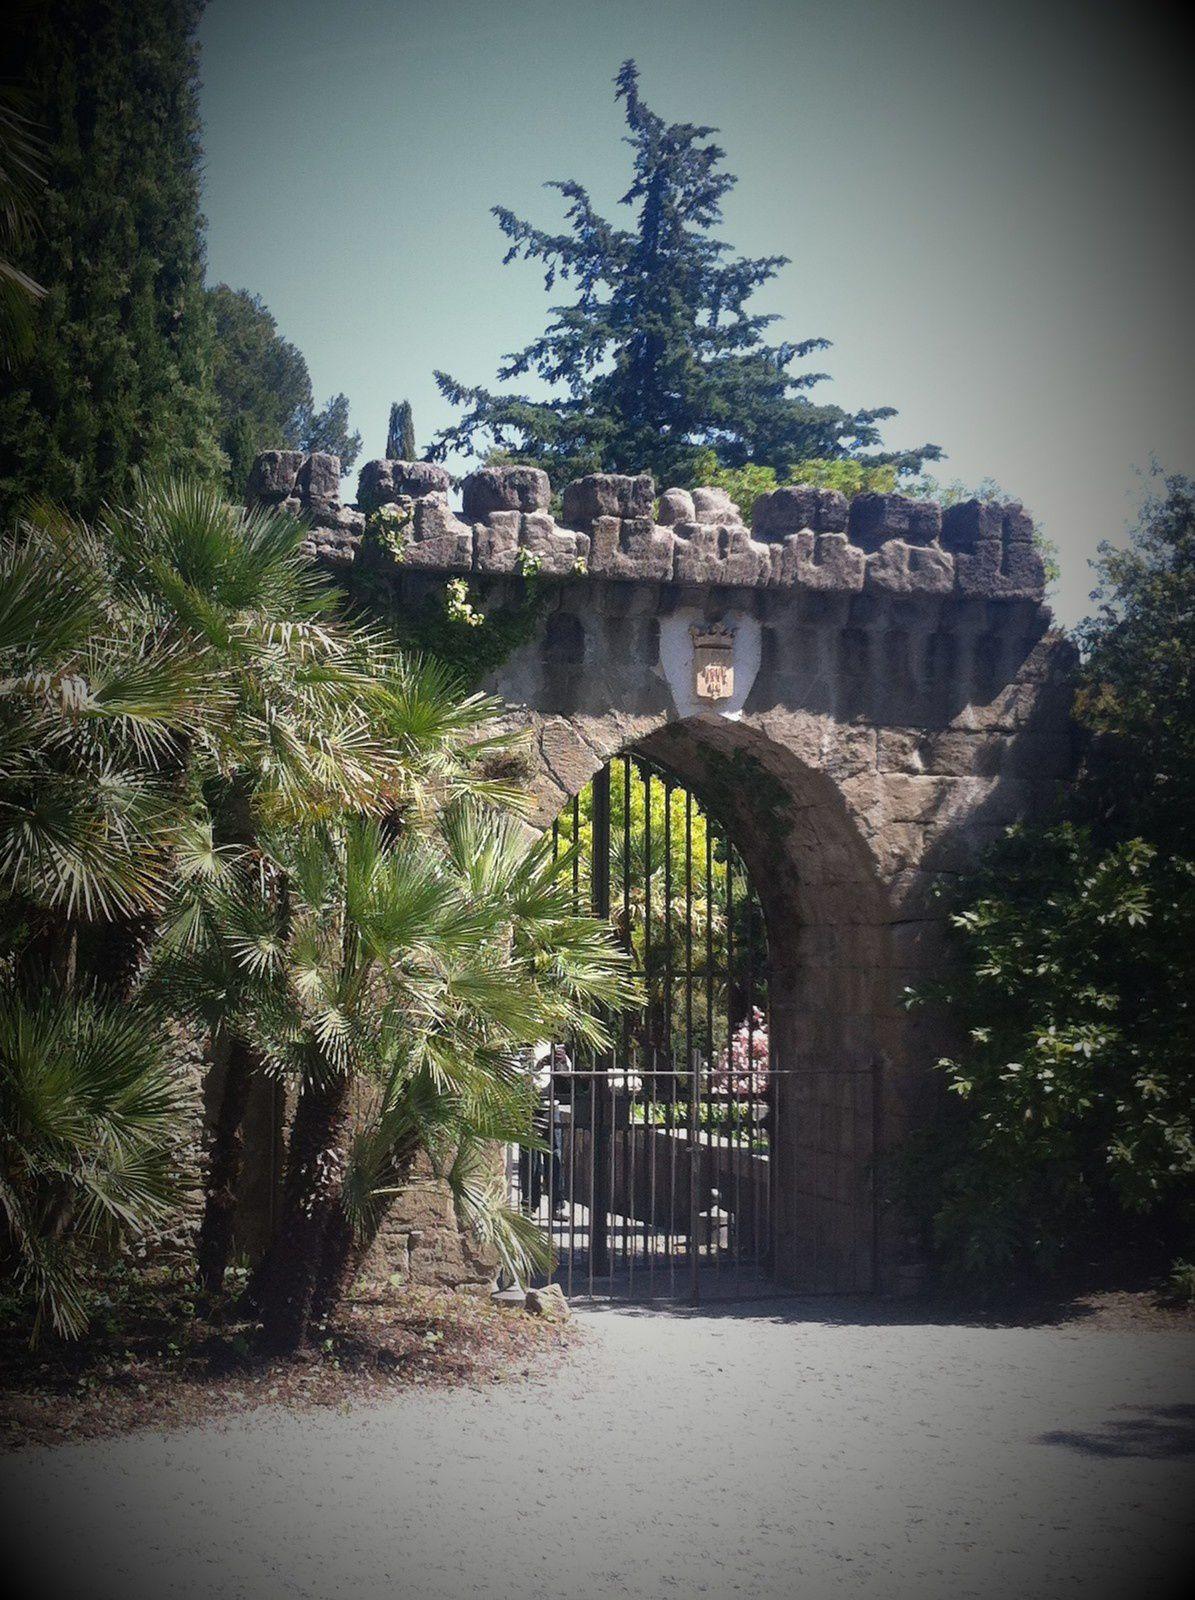 Sortie sympa : visite de la forteresse médiévale de Villeuneuve Loubet (bis)